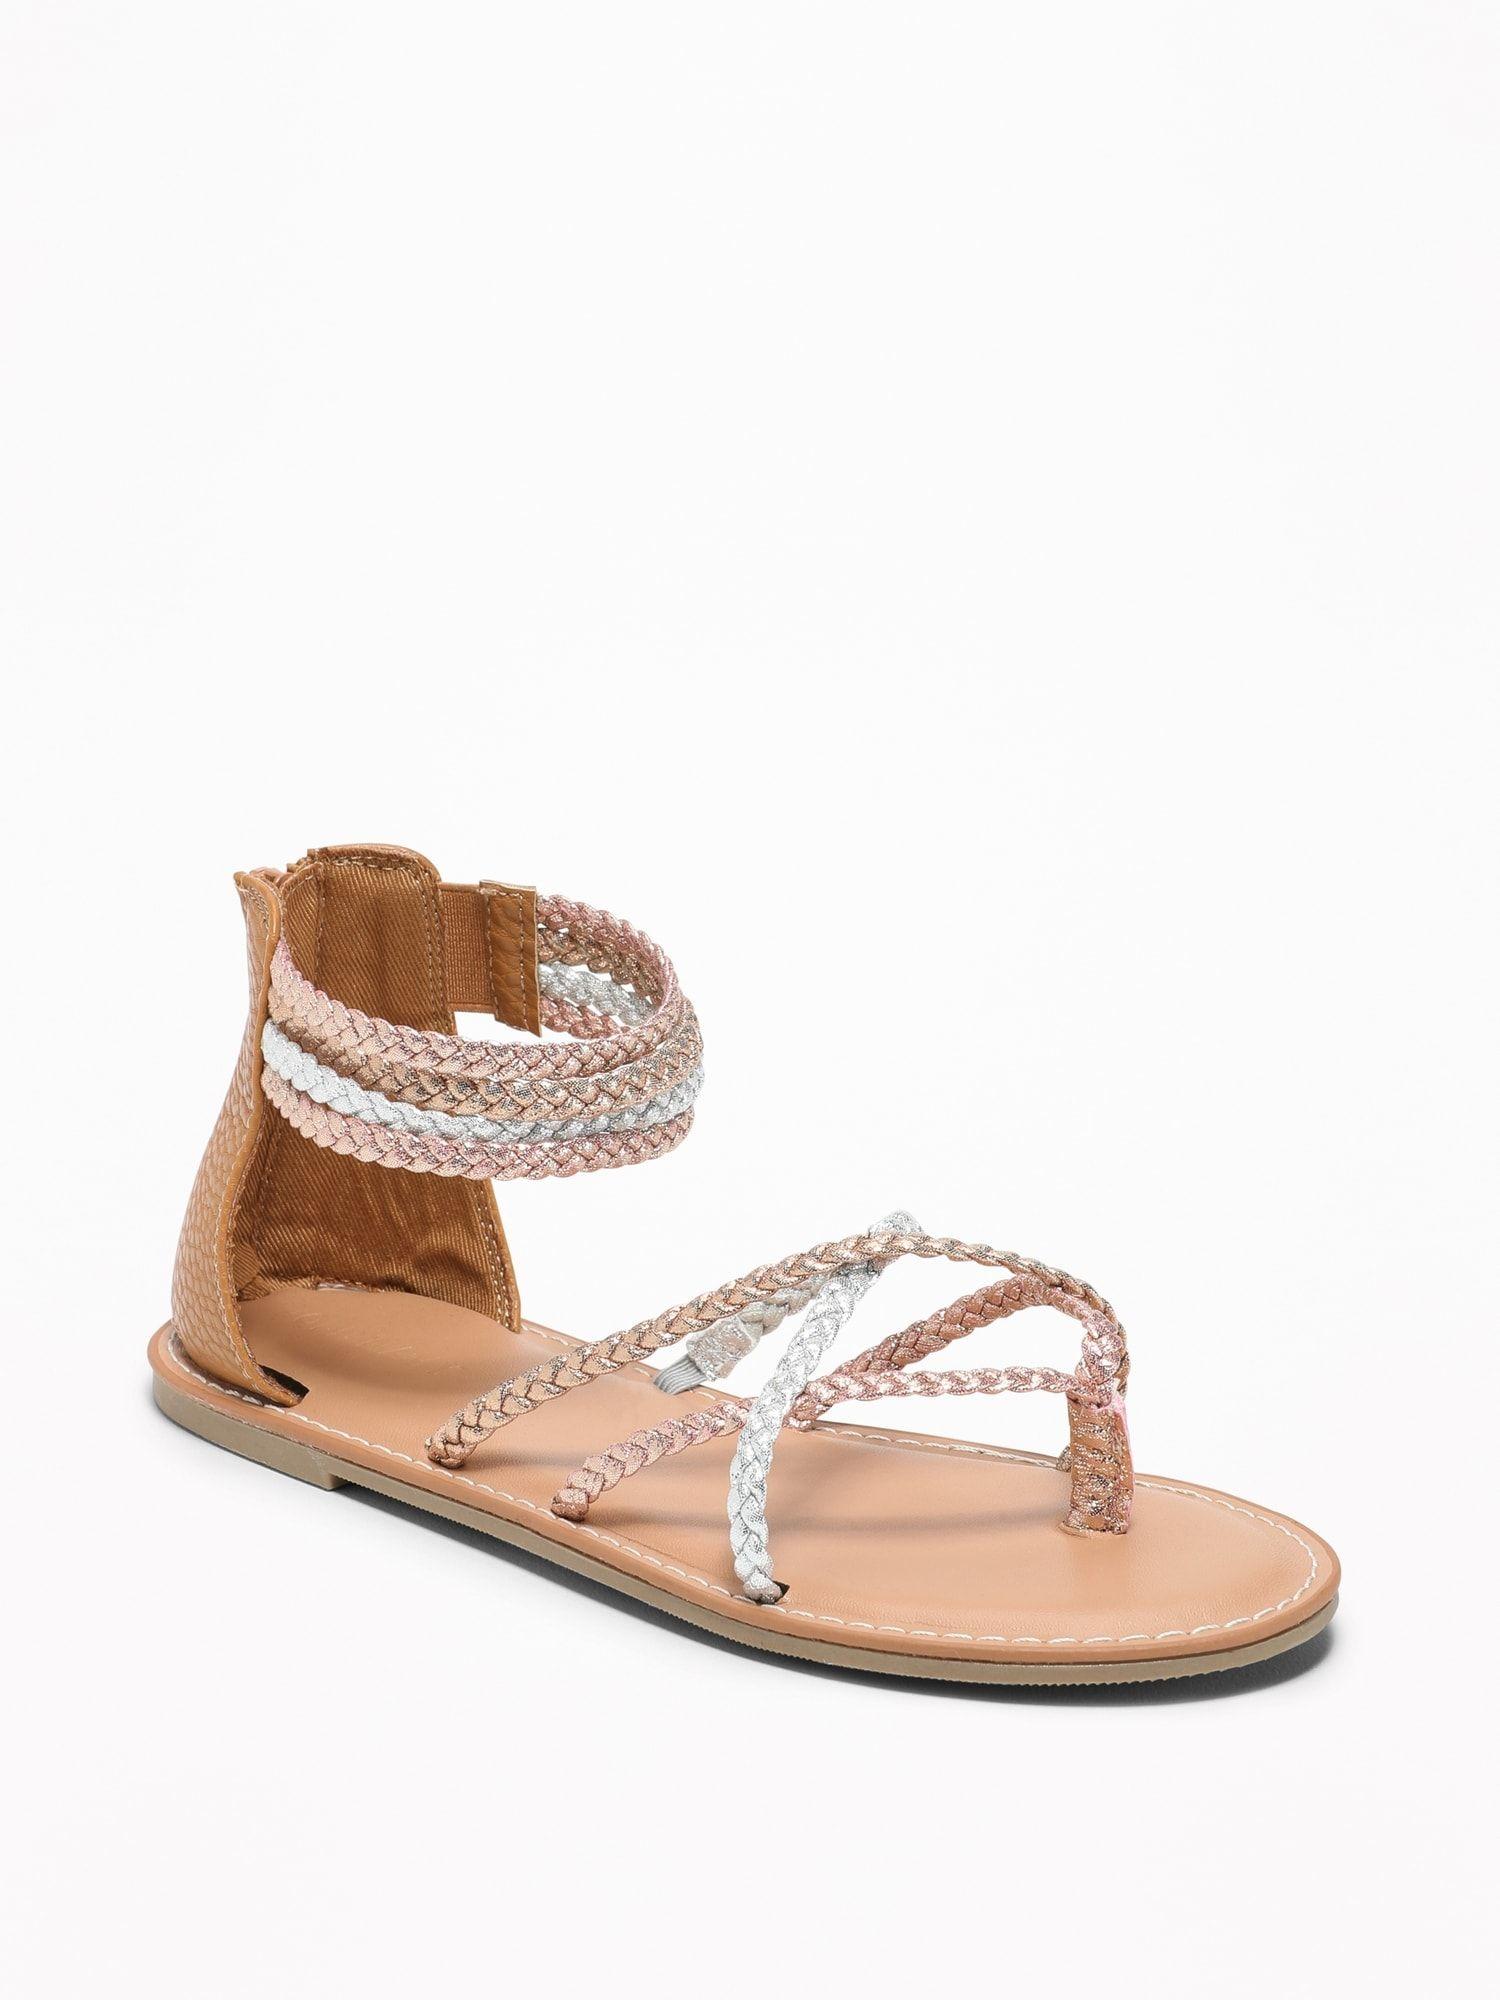 4b1d023bcff Metallic-Braided Gladiator Sandals for Girls